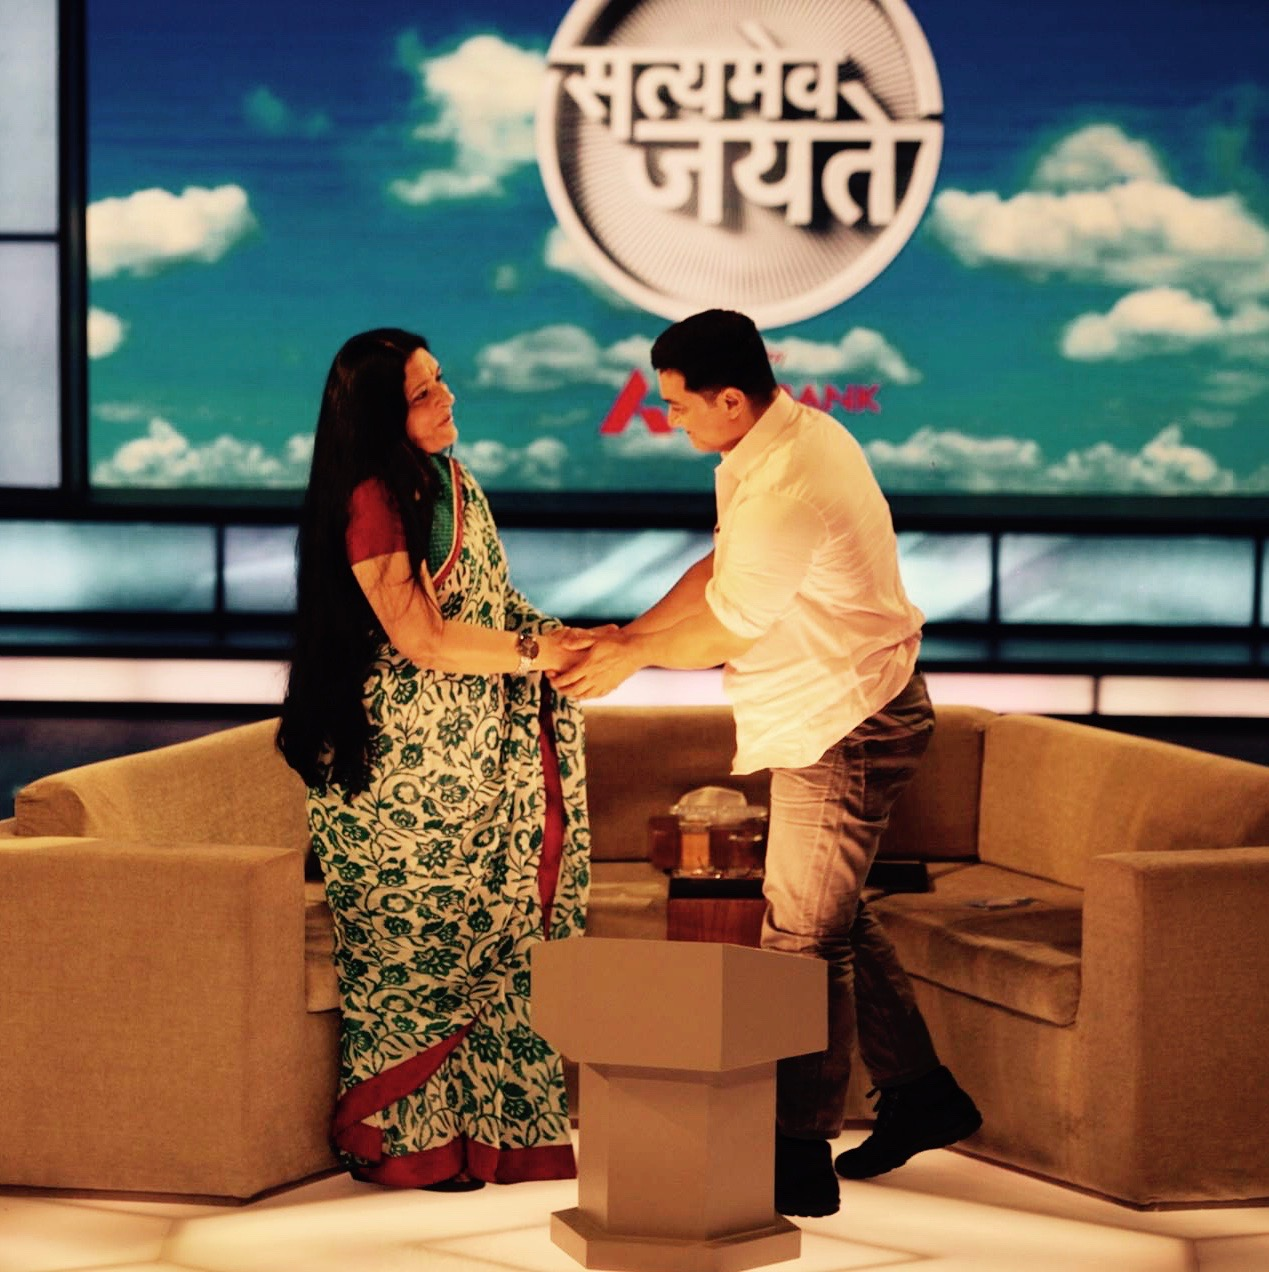 News about Aasha